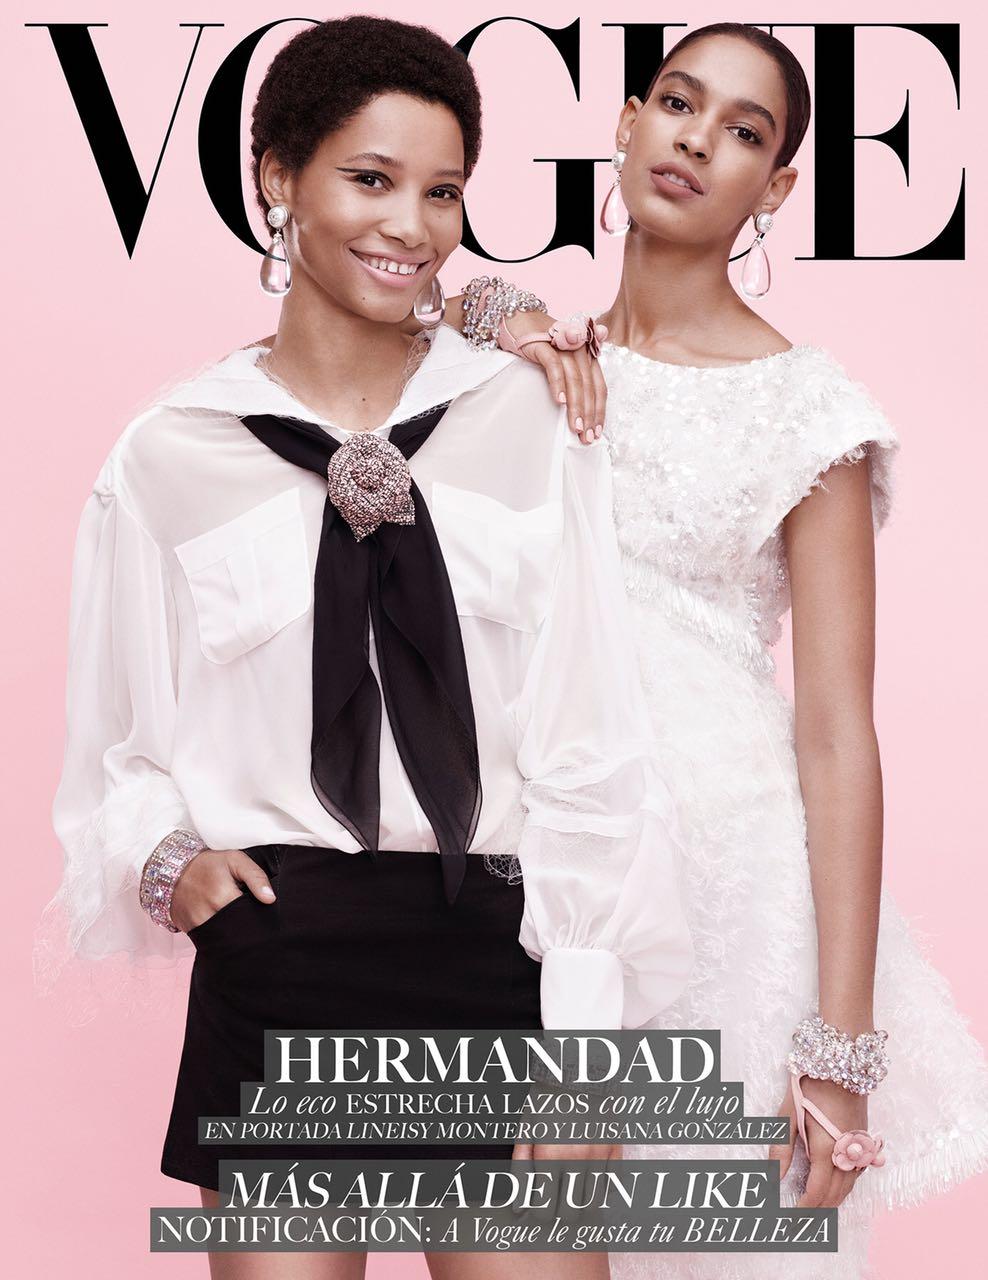 Vogue Latinoamerica Magazine_April 2018_Cover.jpg